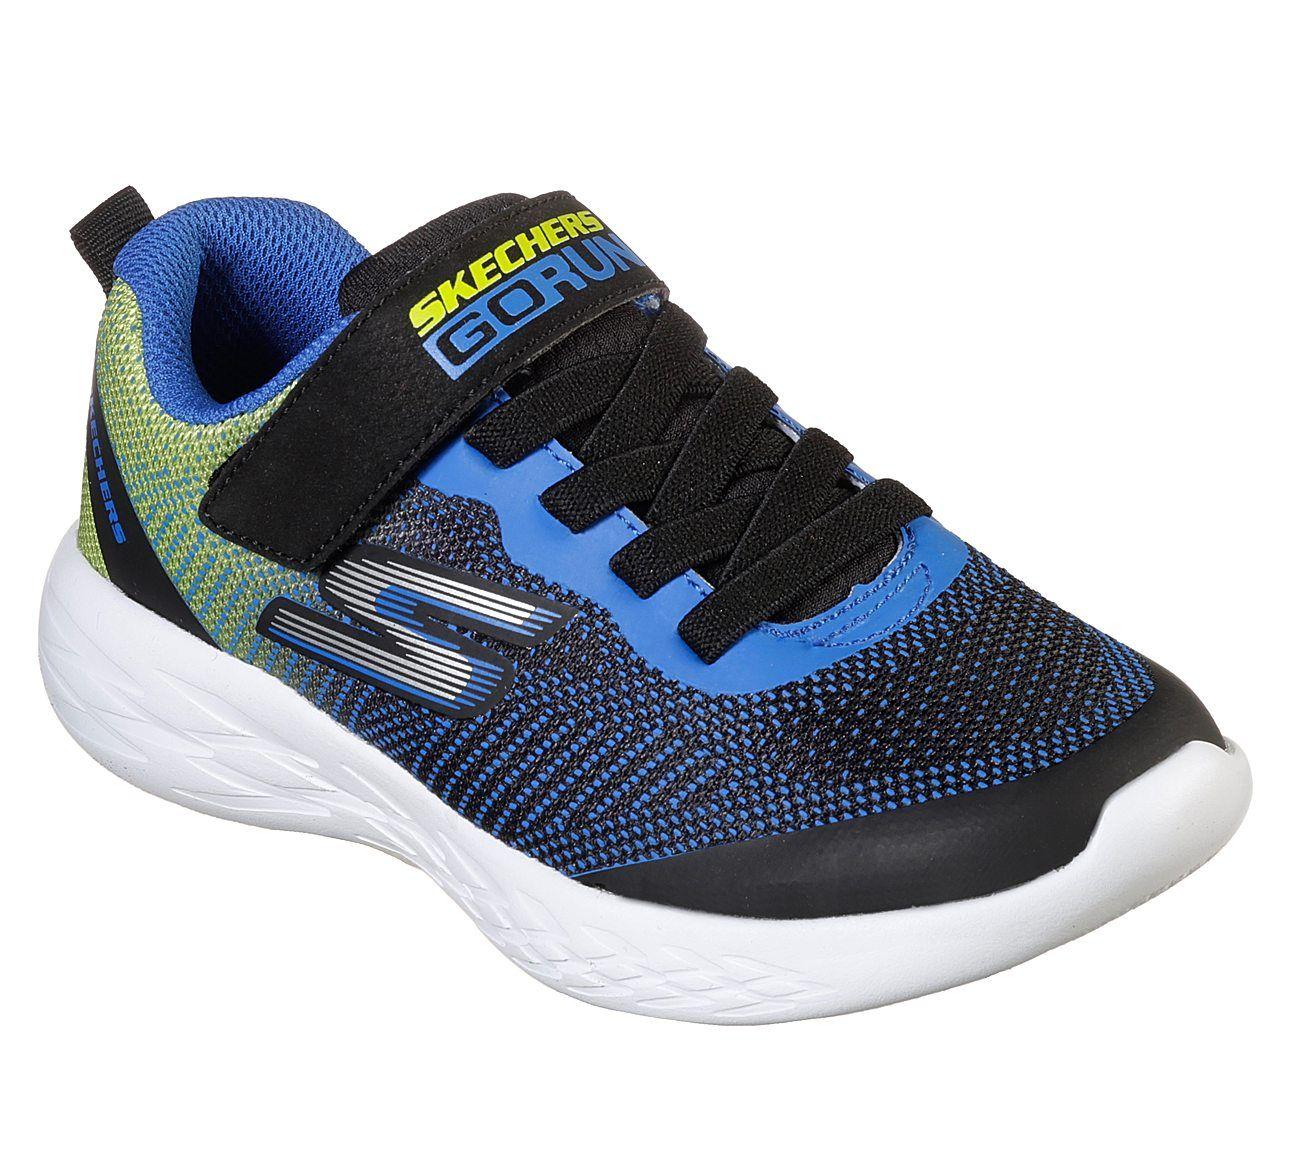 skechers sneakers australia